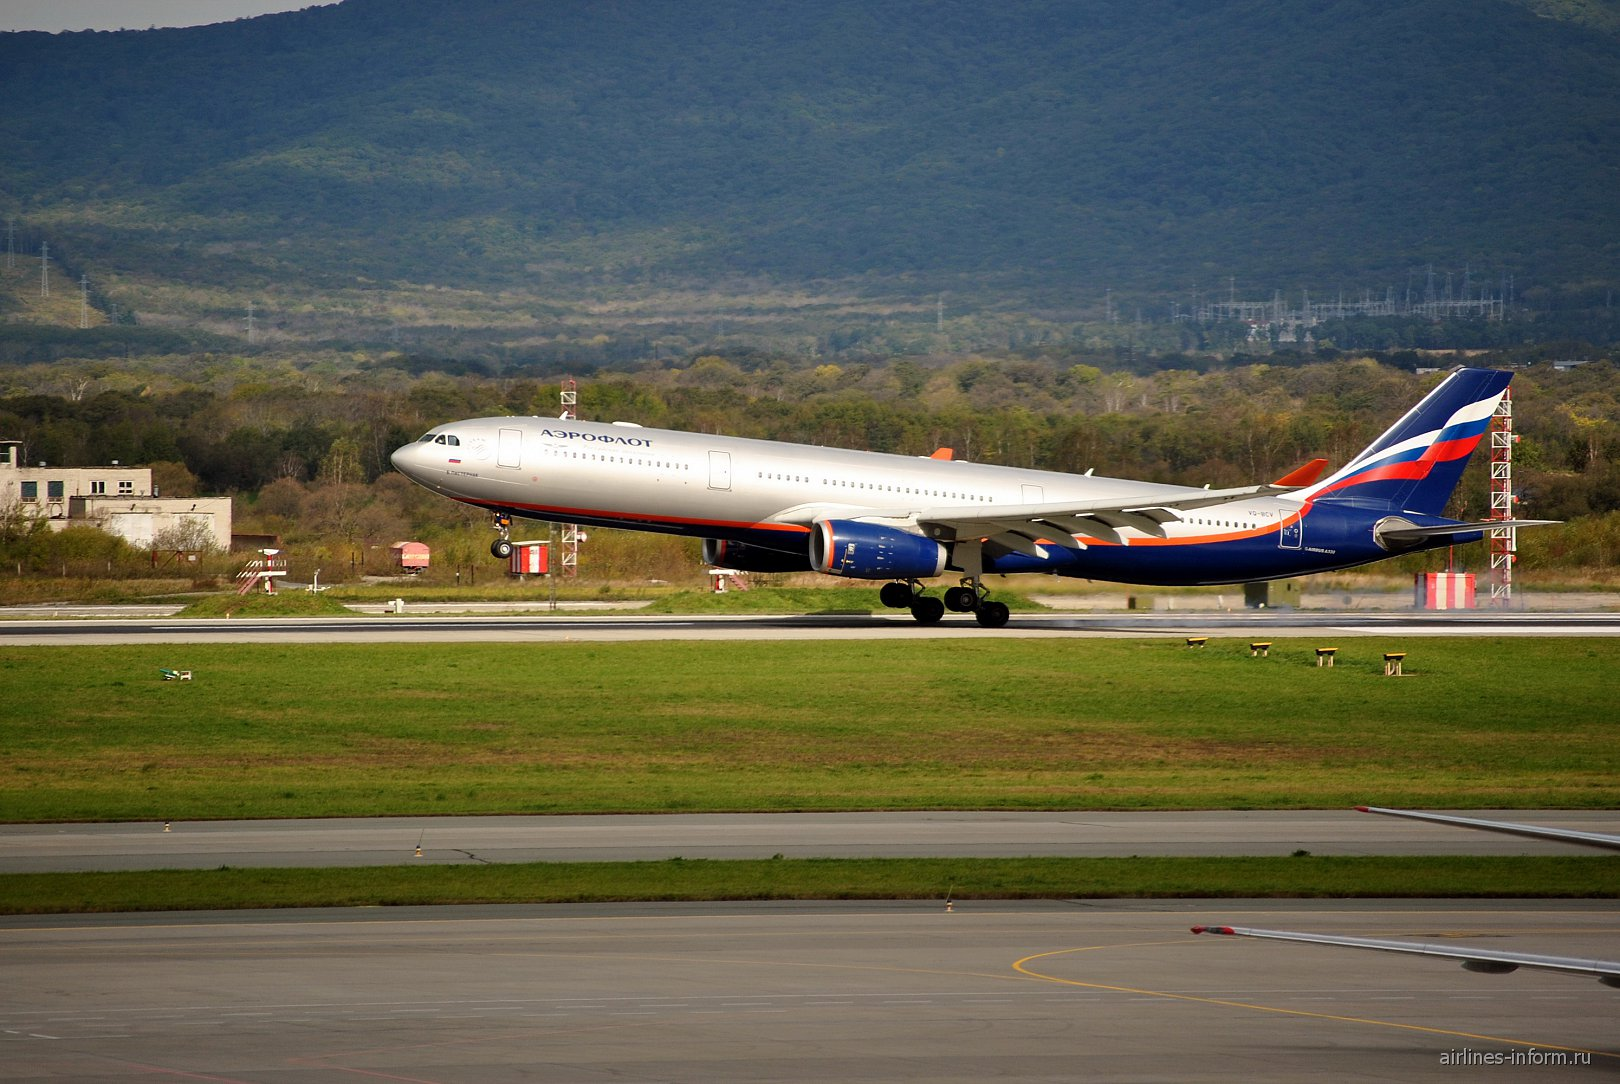 Airbus A330-300 Аэрофлота совершает посадку в аэропорту Владивостока